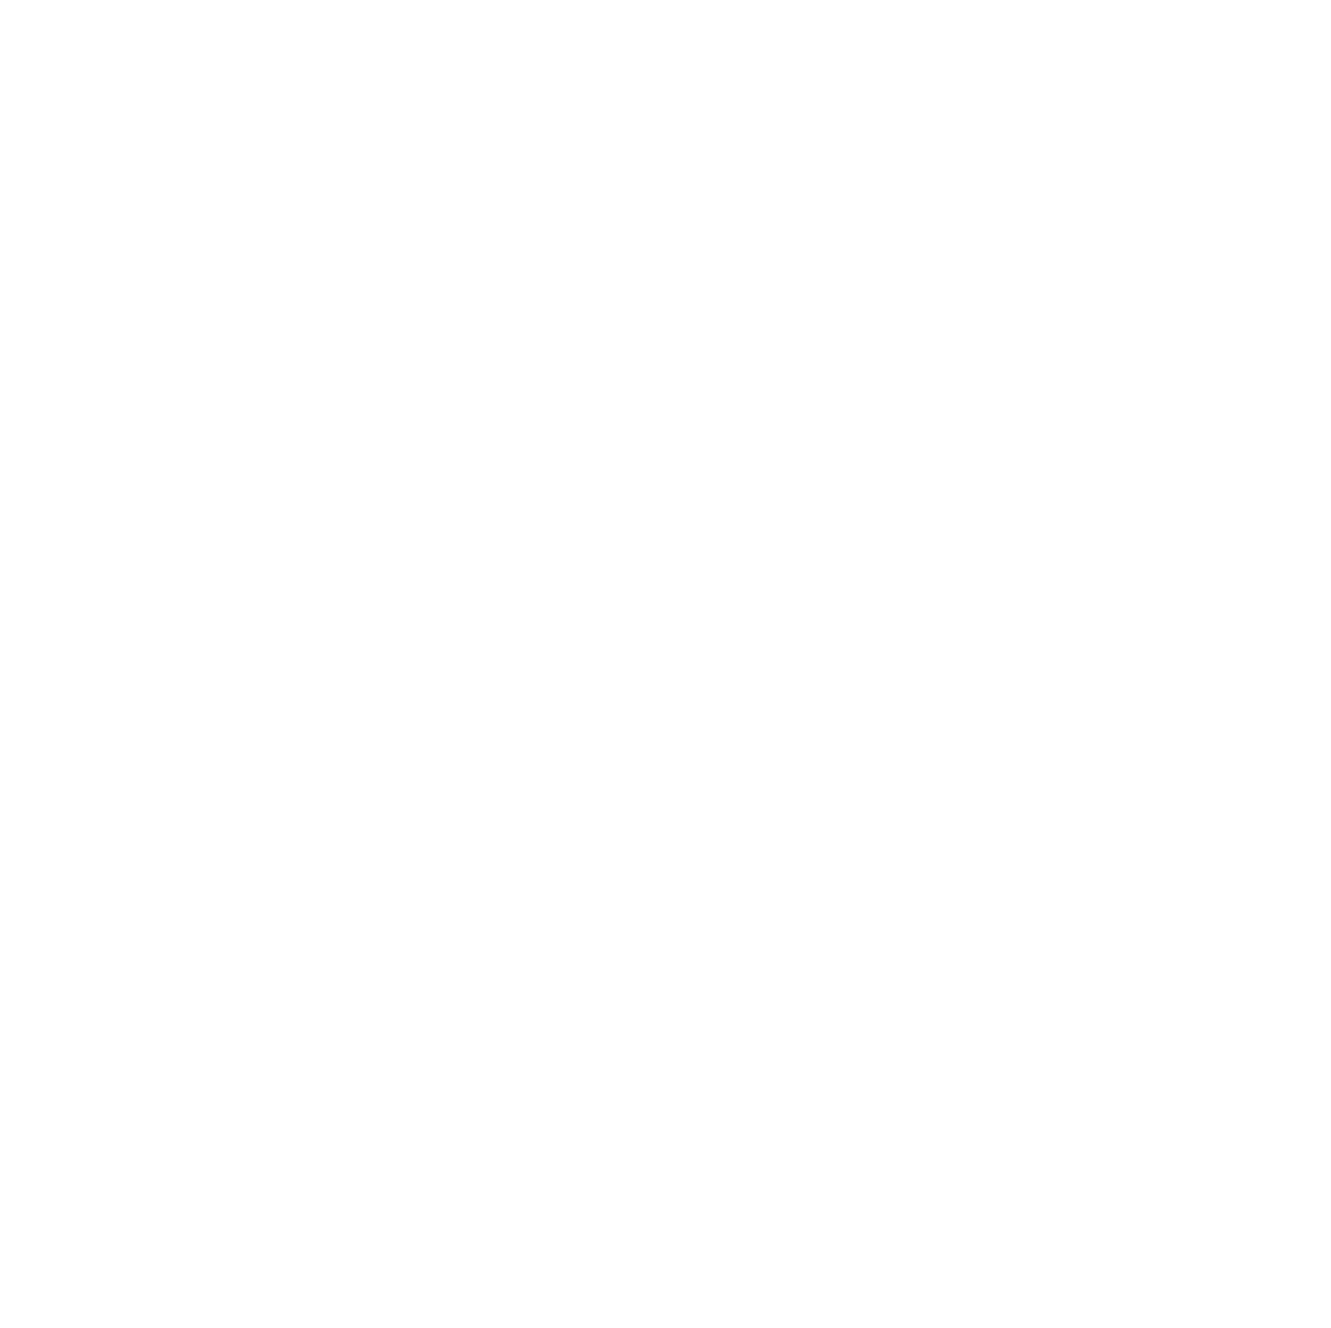 Digsubstation – FH Oberösterreich Studienprojekt